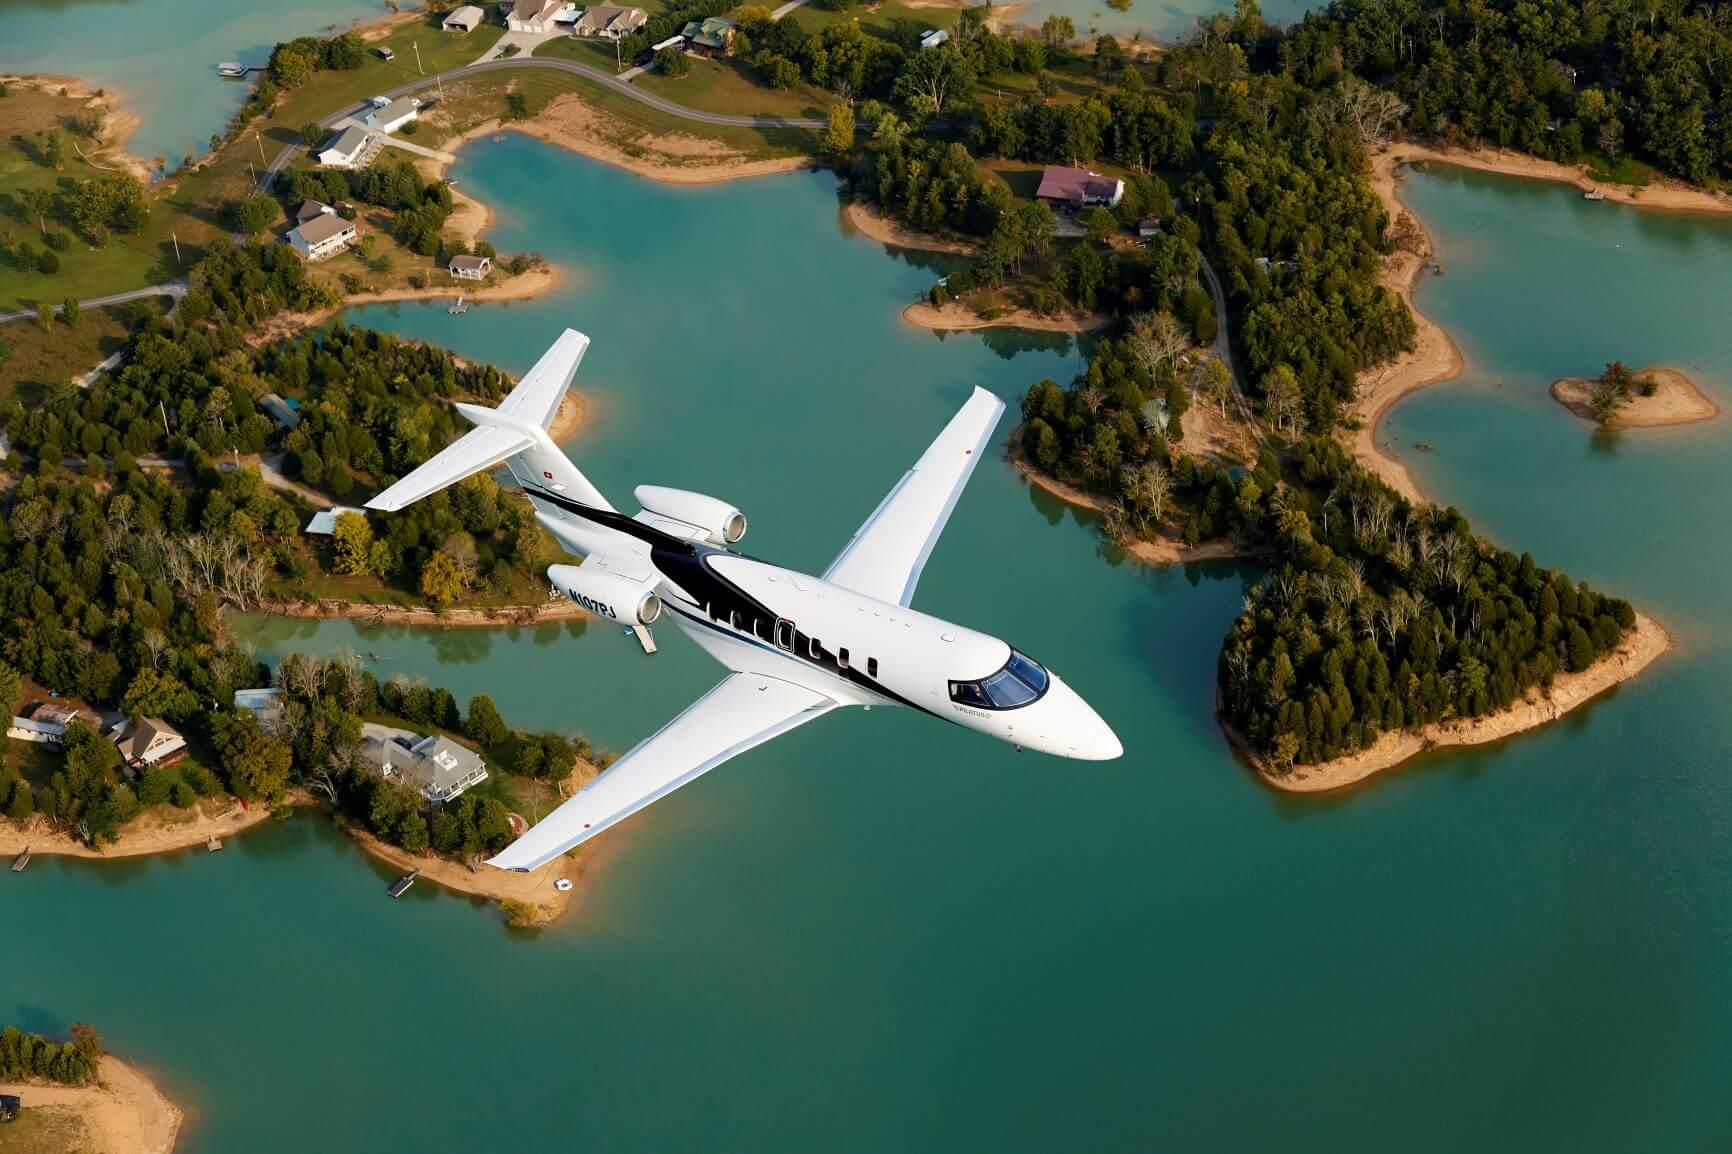 pc-24-super-versatile-jet new low res